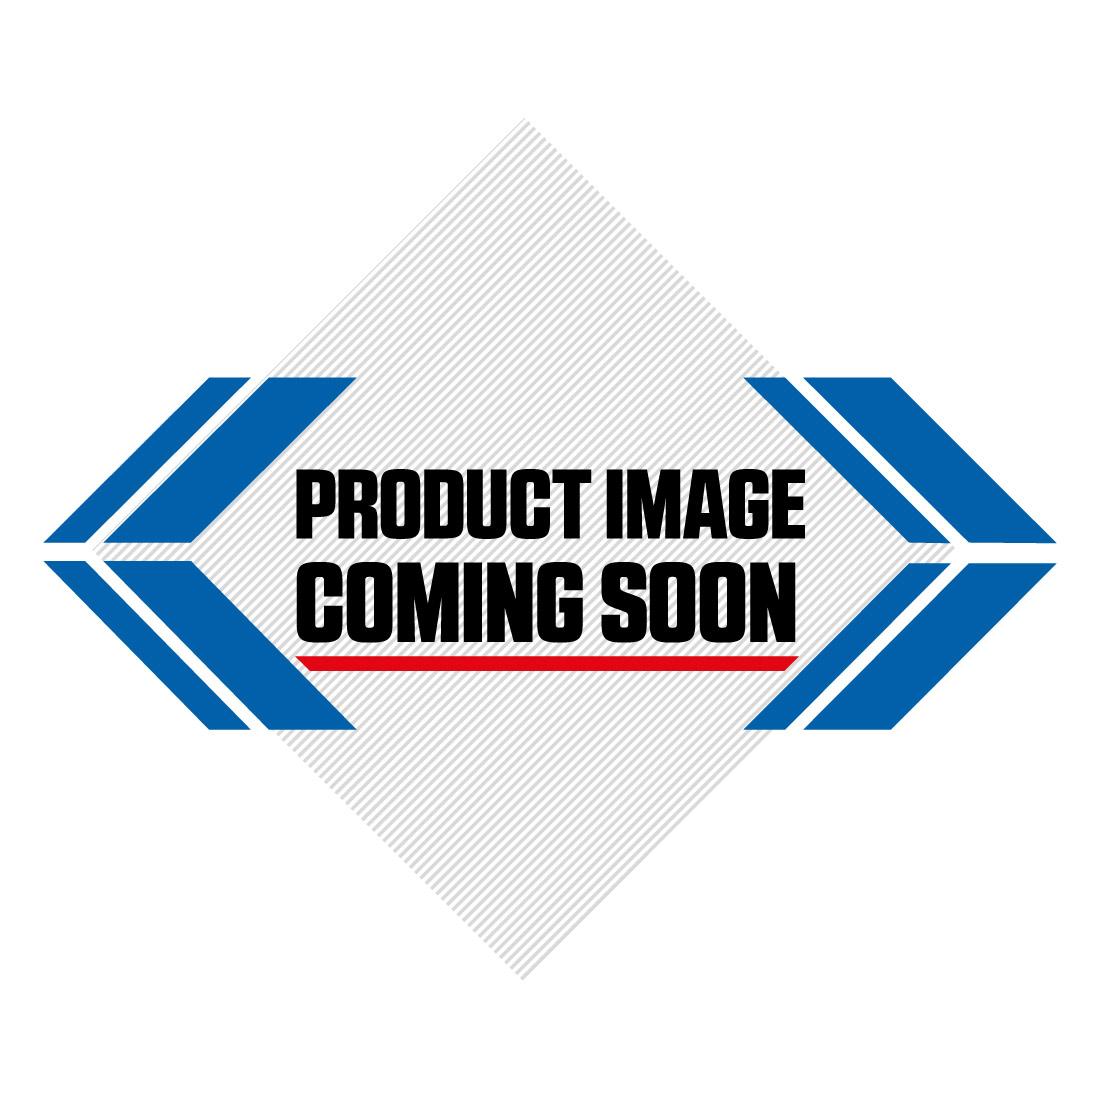 UFO KTM Plastic Kit SX 125 150 250 SXF 250 350 450 (16-18) OEM 16 Image-4